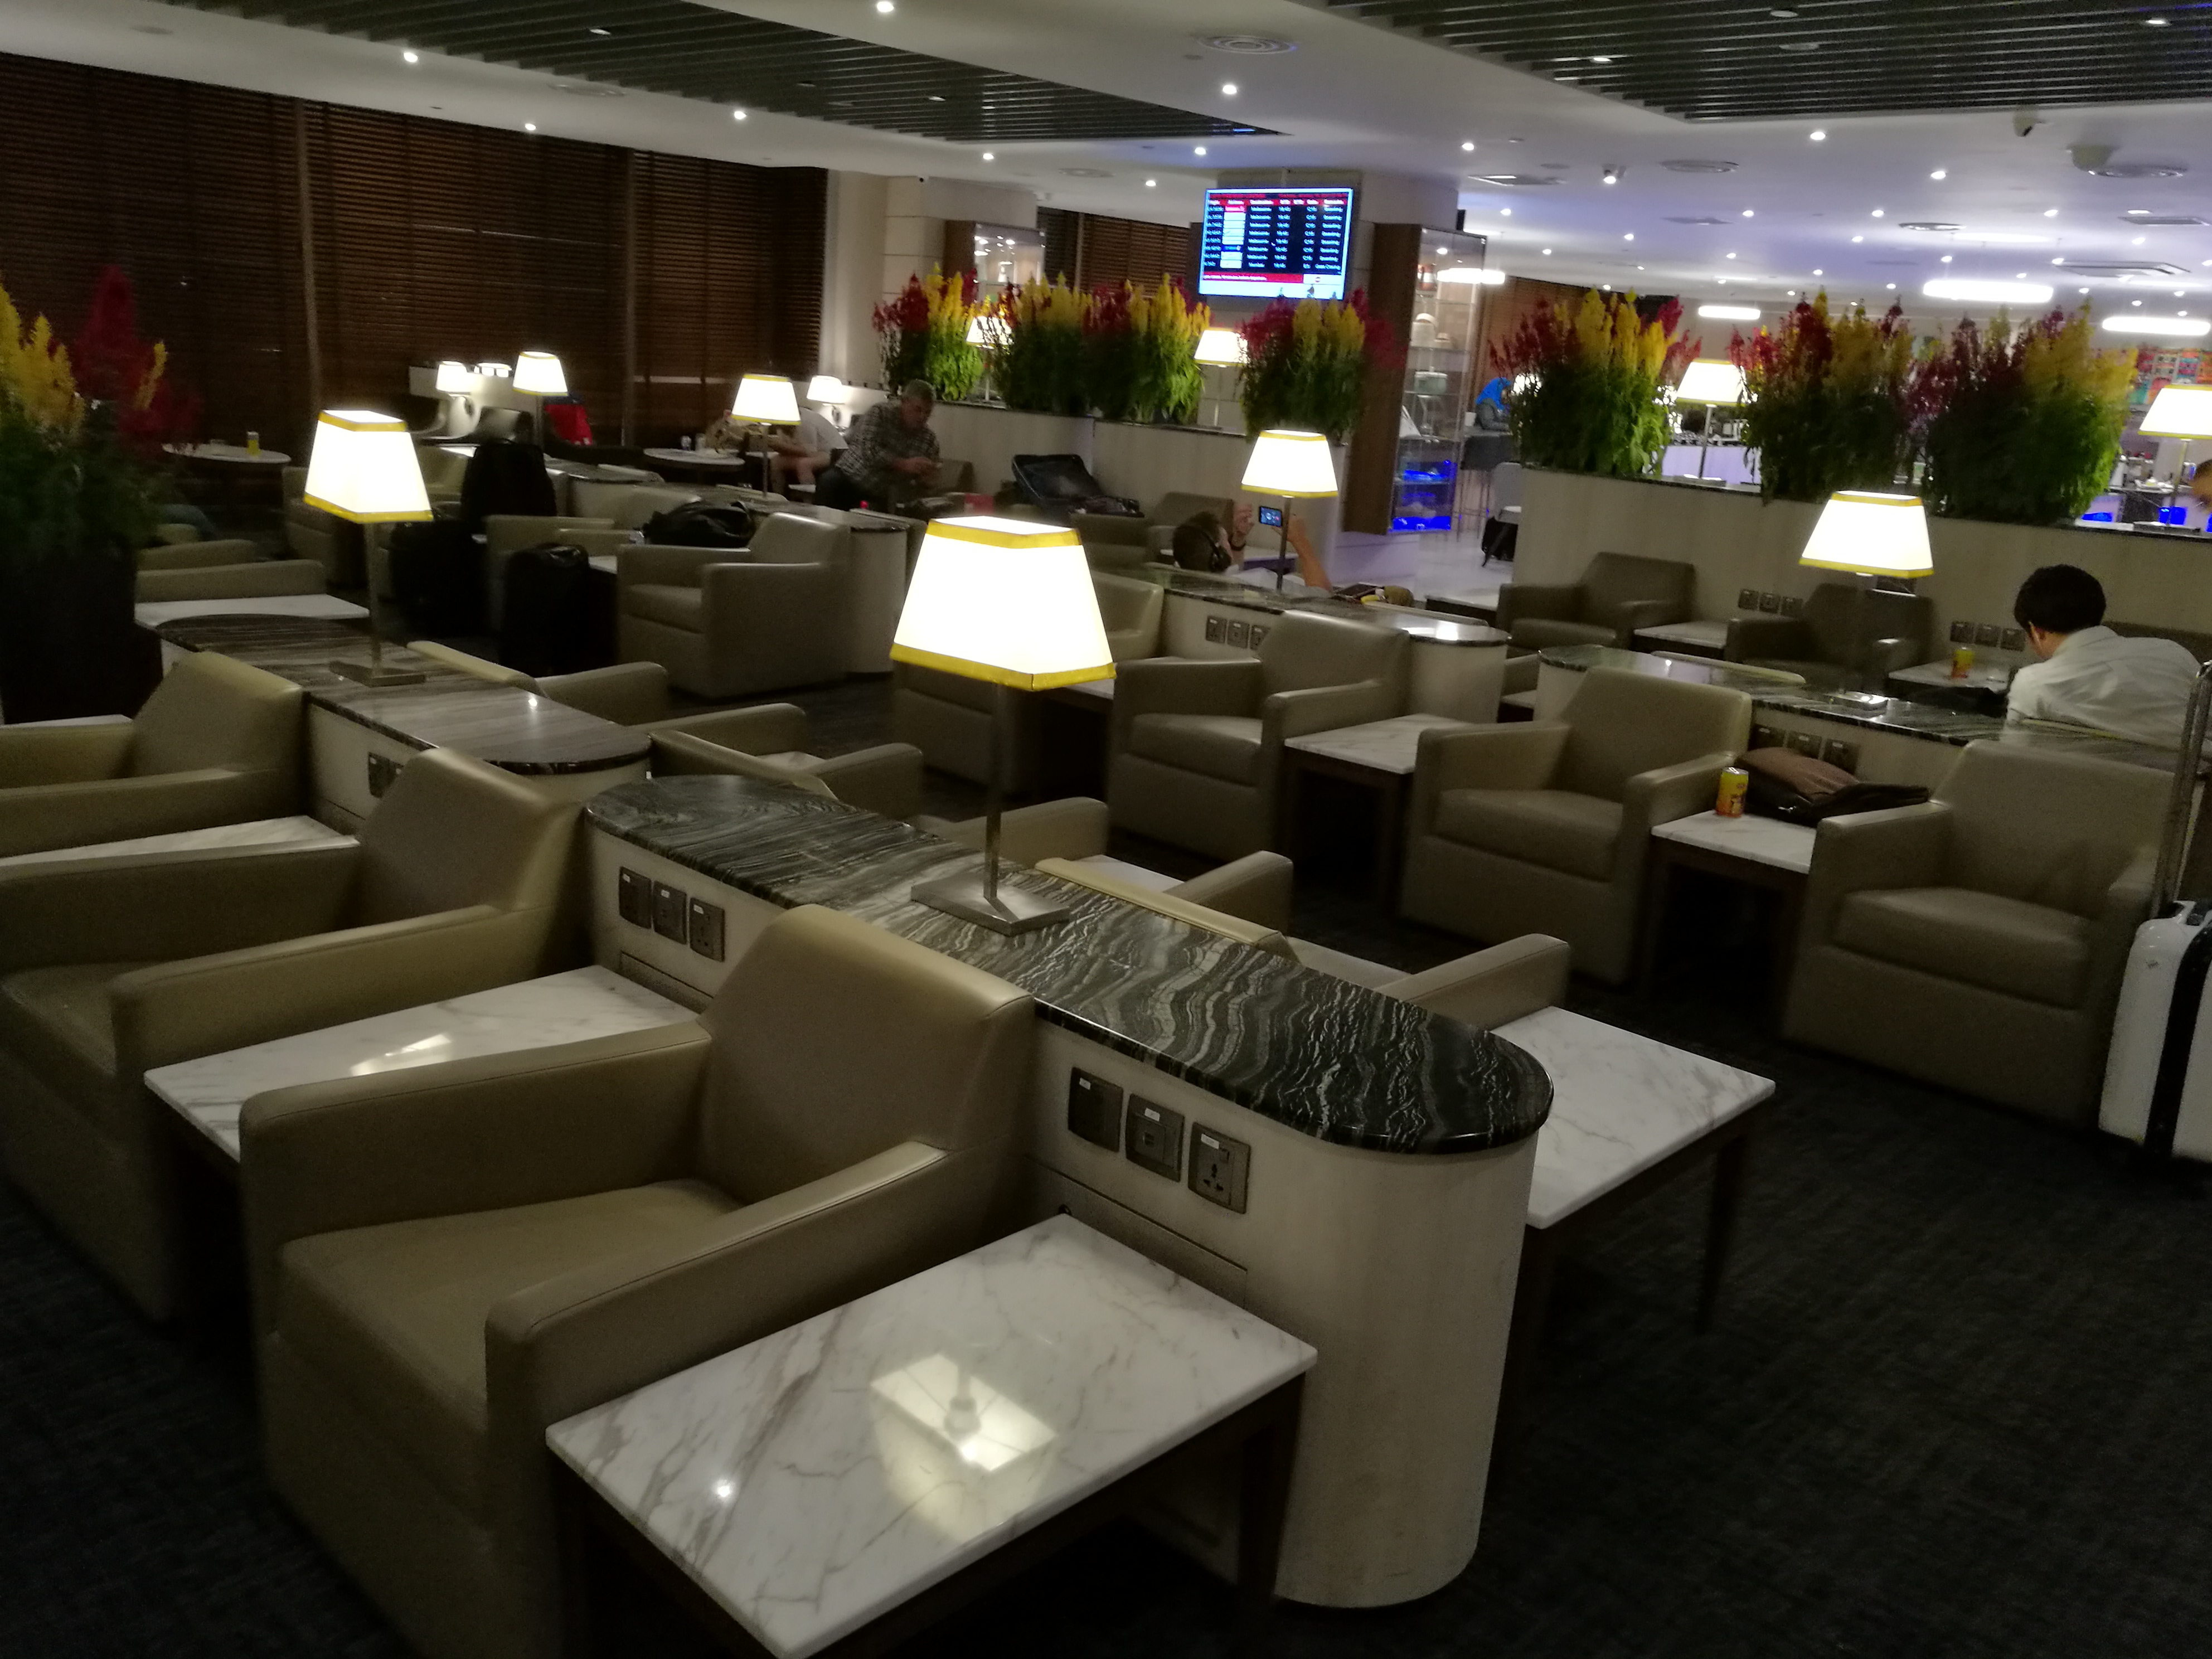 [ANA SFC修行]シンガポール・チャンギ空港の航空会社ラウンジ「SATS Premium Lounge」に行ってみた